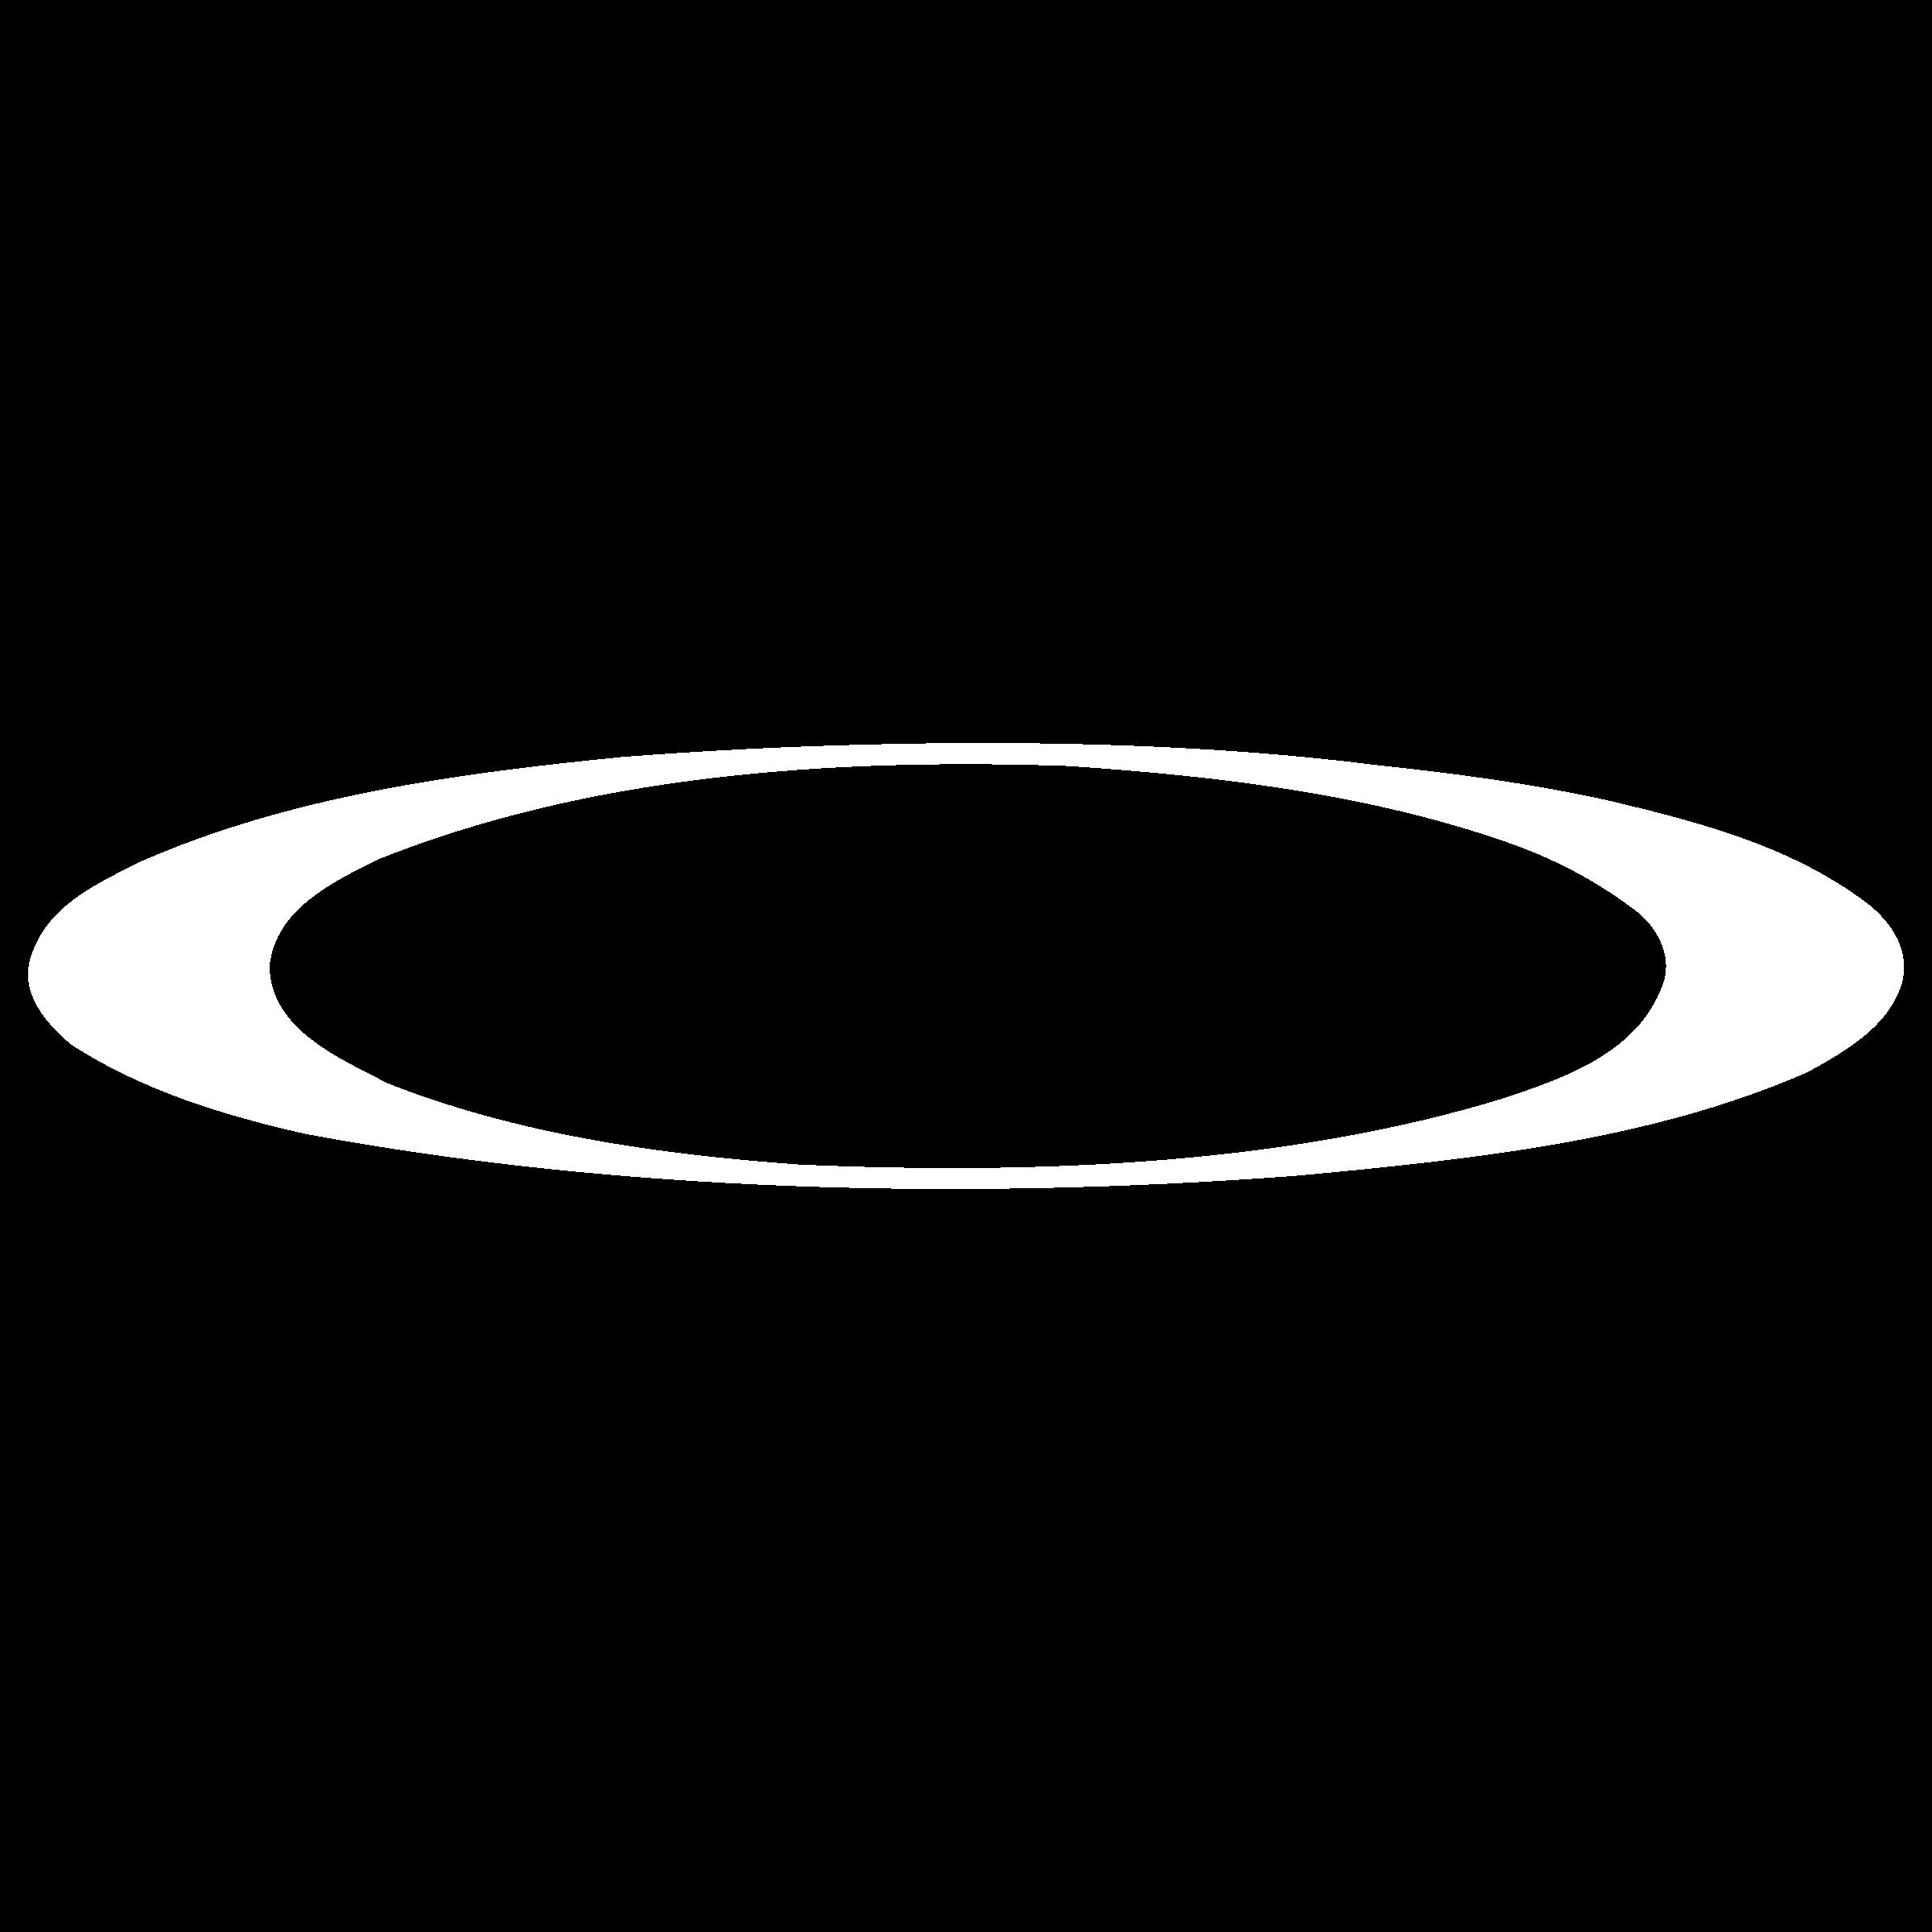 Pierce Logo PNG Transparent & SVG Vector.